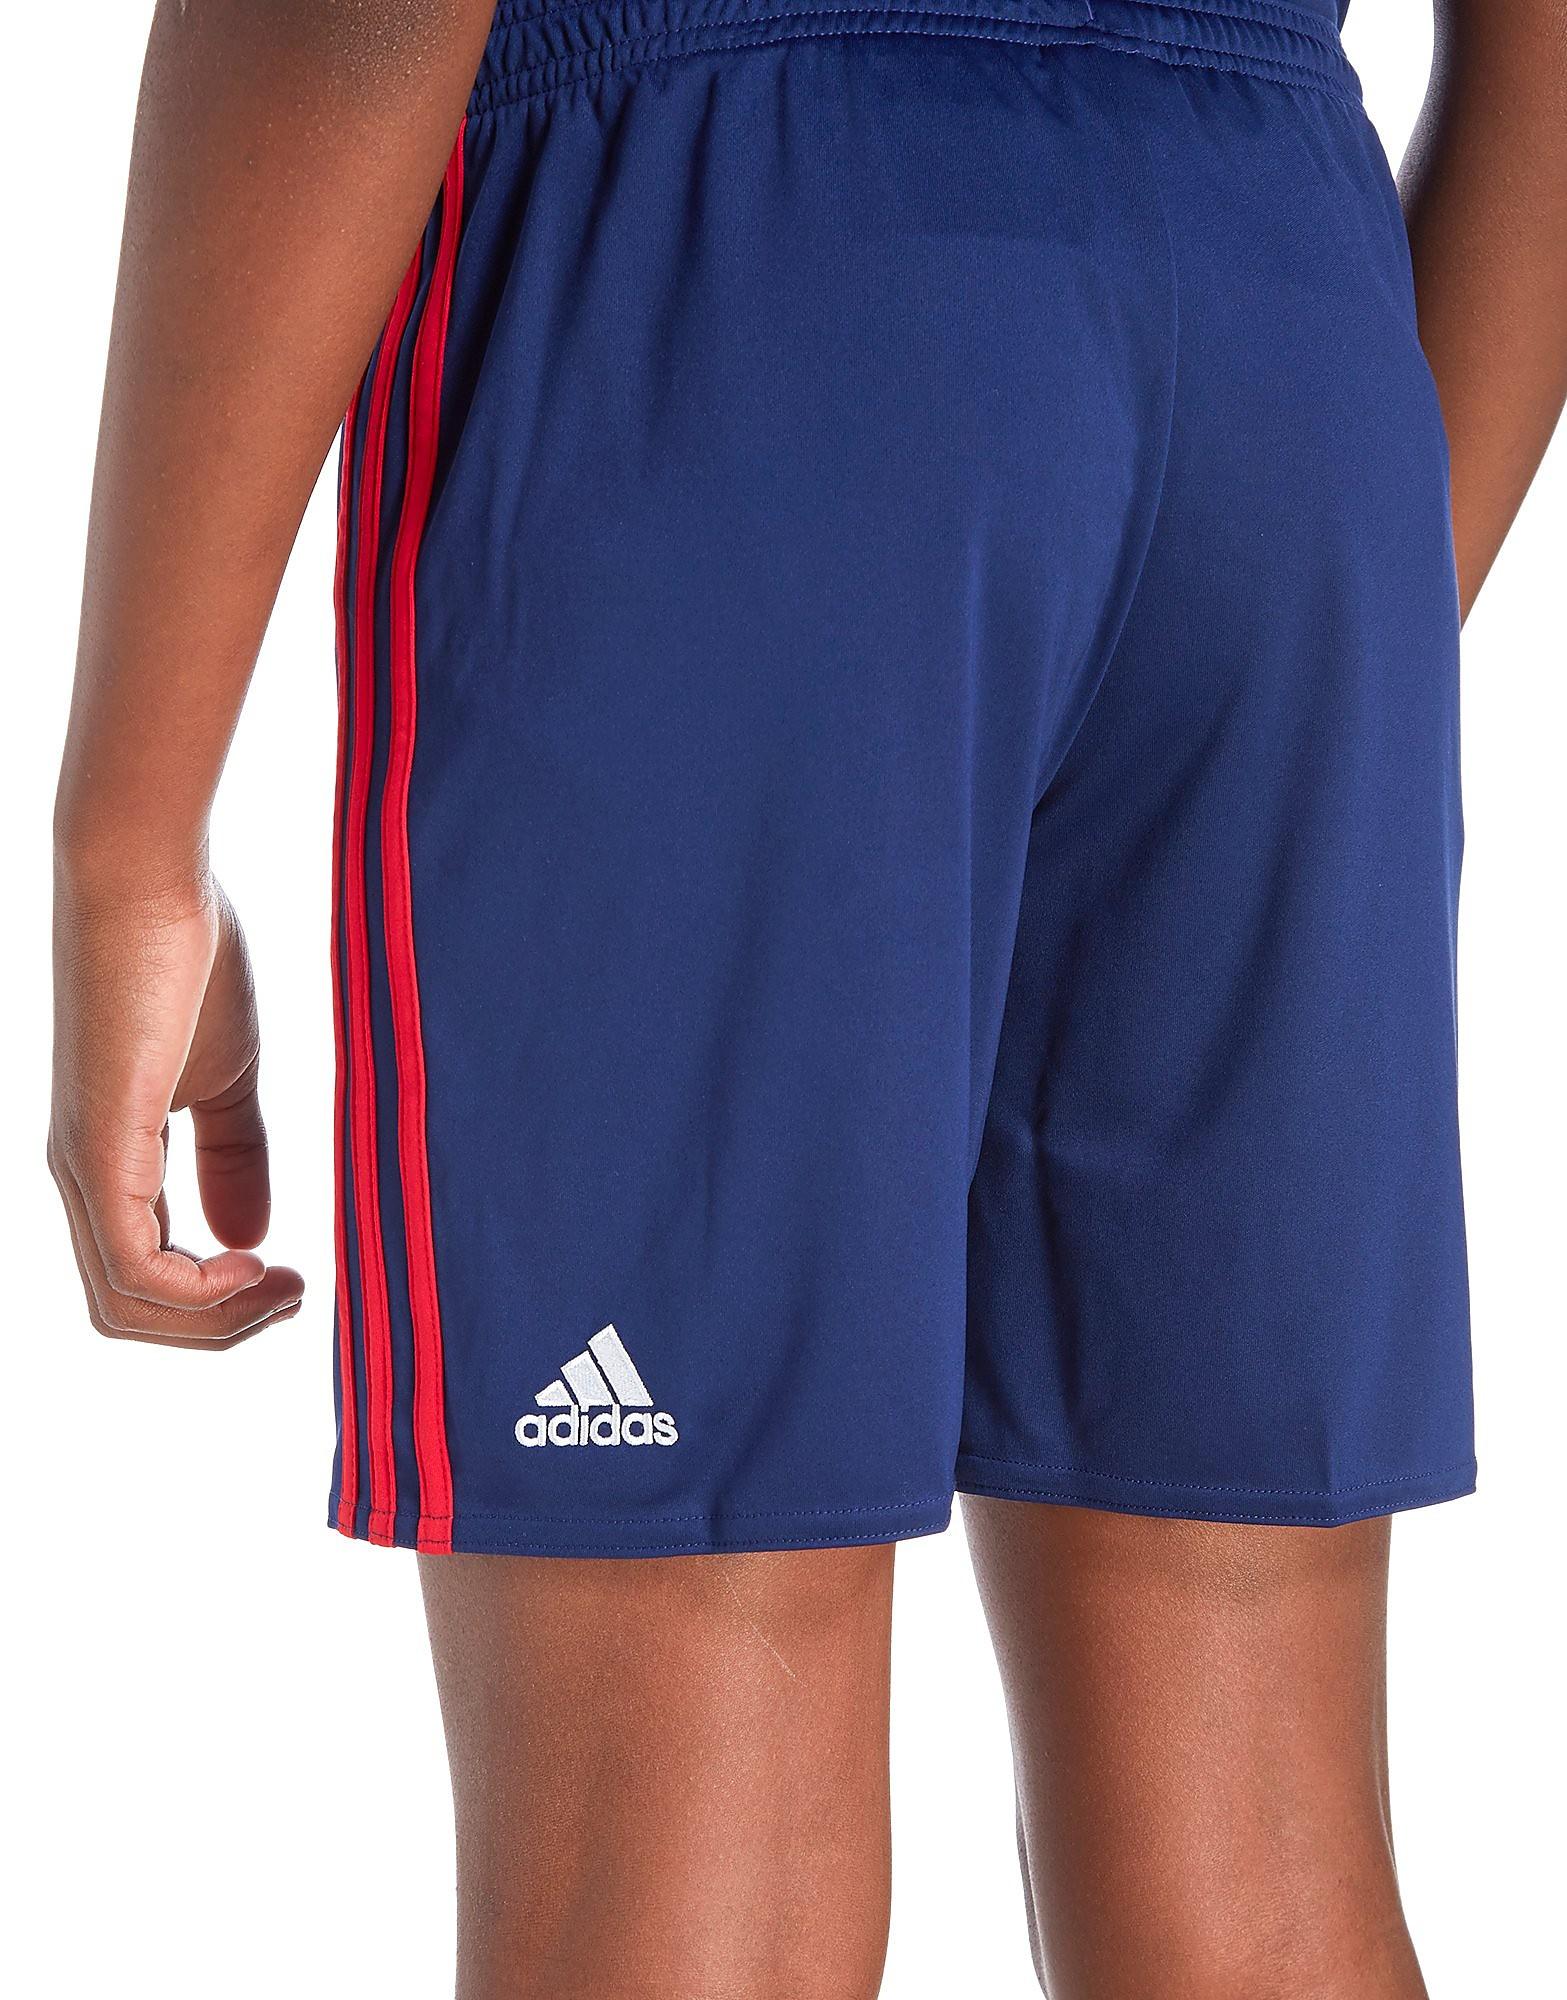 adidas Ajax 2017/18 Away Shorts Junior